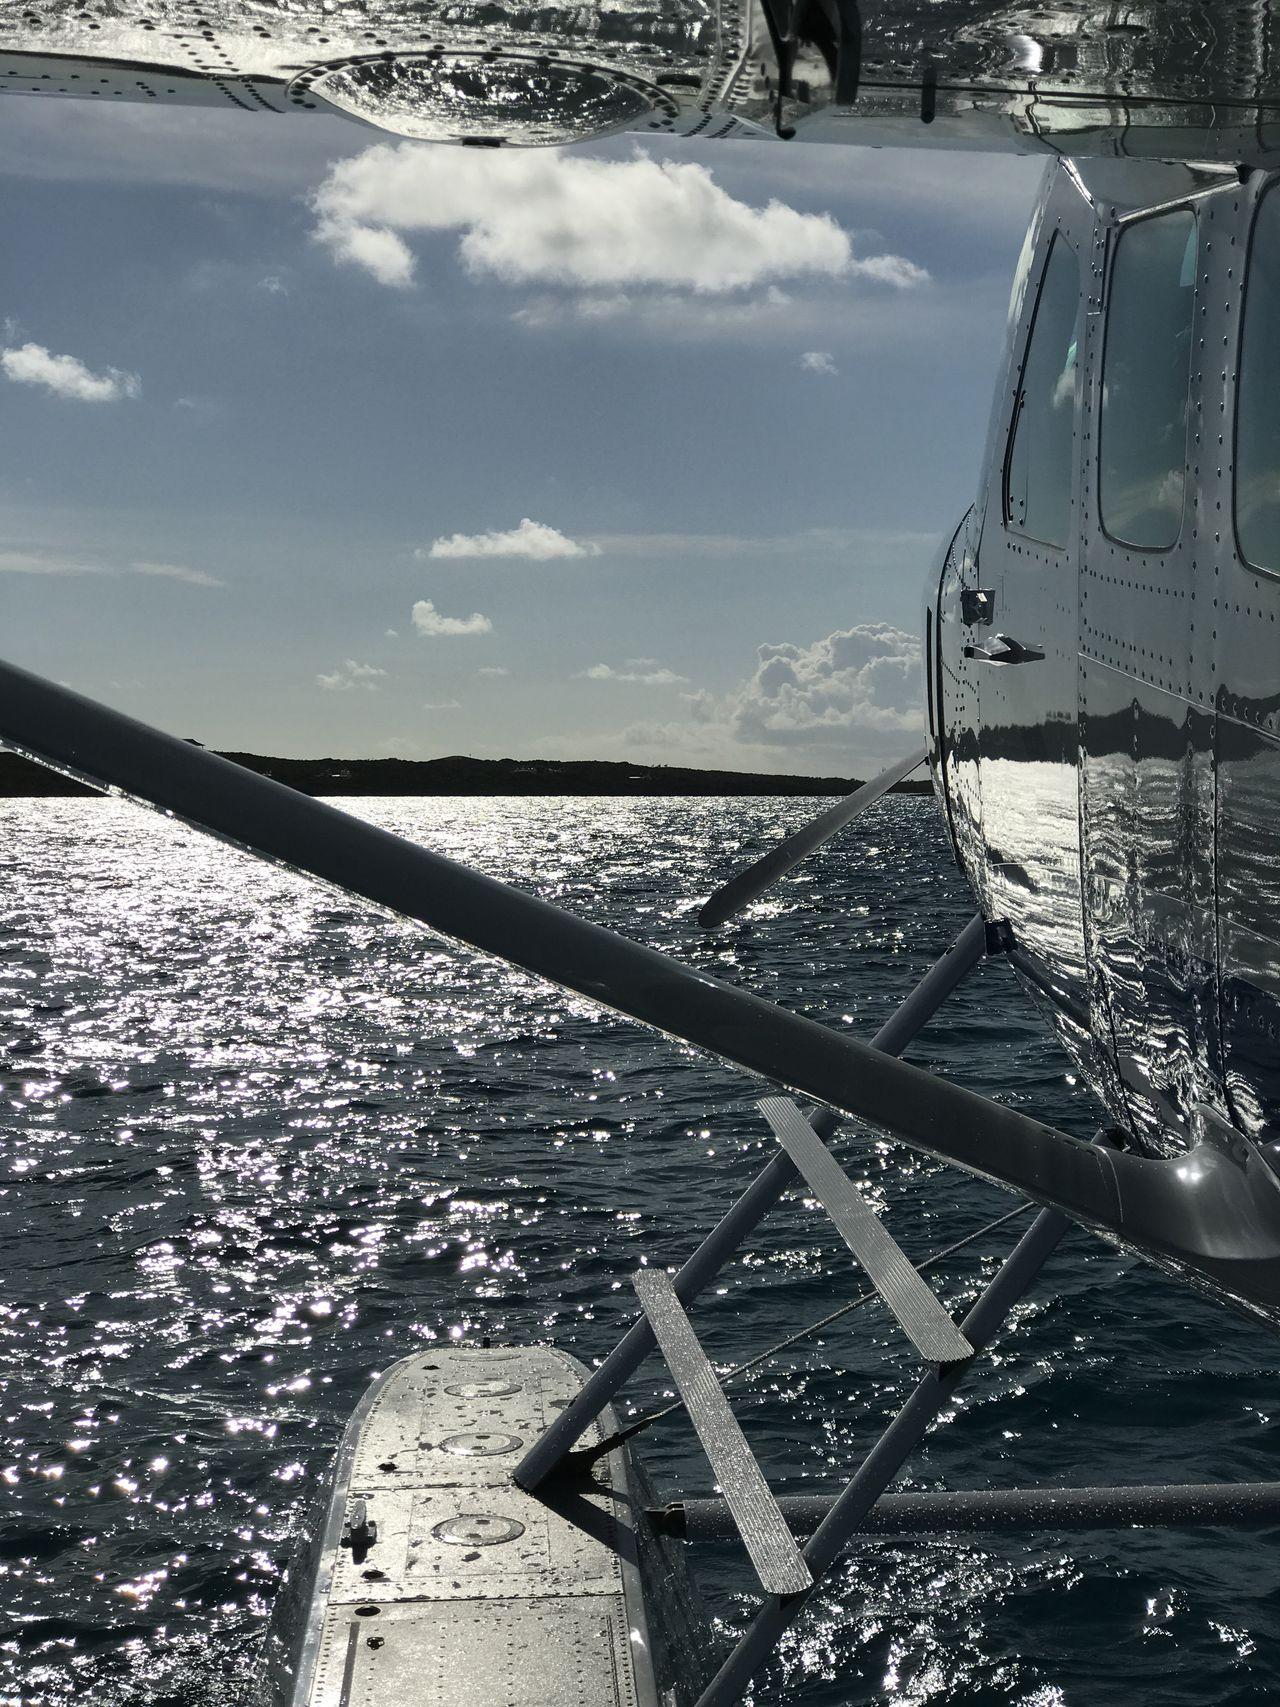 Seaplane reflections 45201 Bahamas Reflection Seaplane Airplane Aircraft Cessna Caravan Cessna Aviation Ocean Exuma Cays Exuma Outdoors Water Travel Maritime